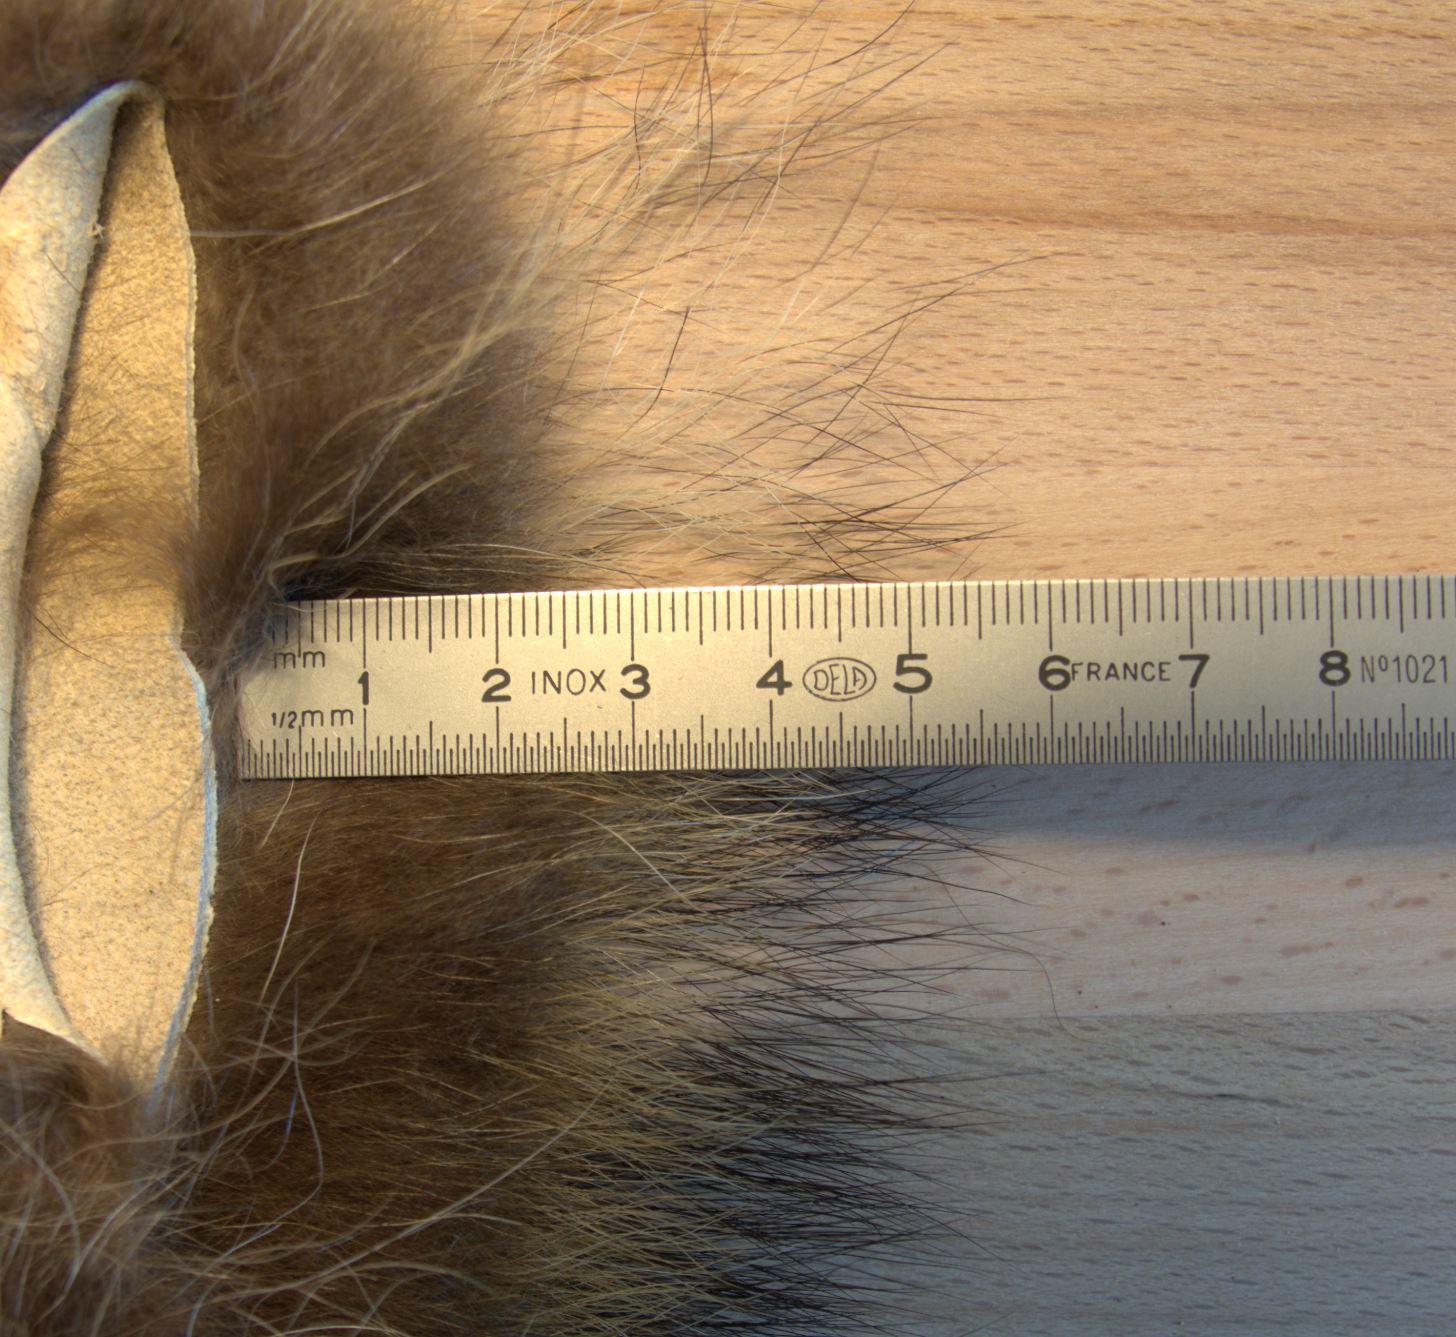 raton laveur raccoon fly tying flytying mouche eclosion fur poil saumon salmon seatrout truite de mer